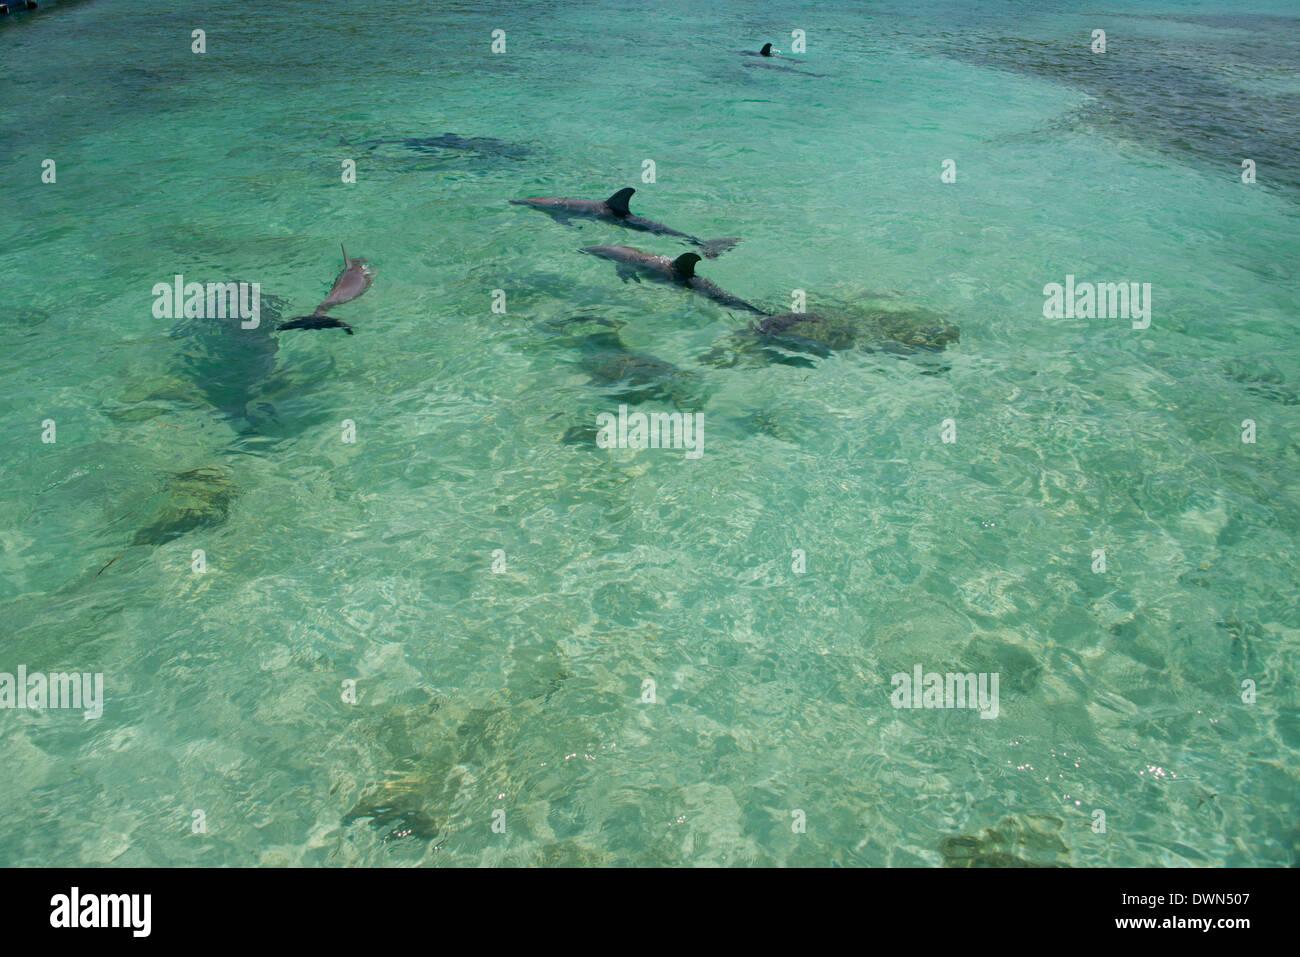 Honduras, Honduran Bay Islands, Roatan. Anthony's Key, pod of bottlenose dolphins (Tursiops truncatus) aka porpoises. Stock Photo